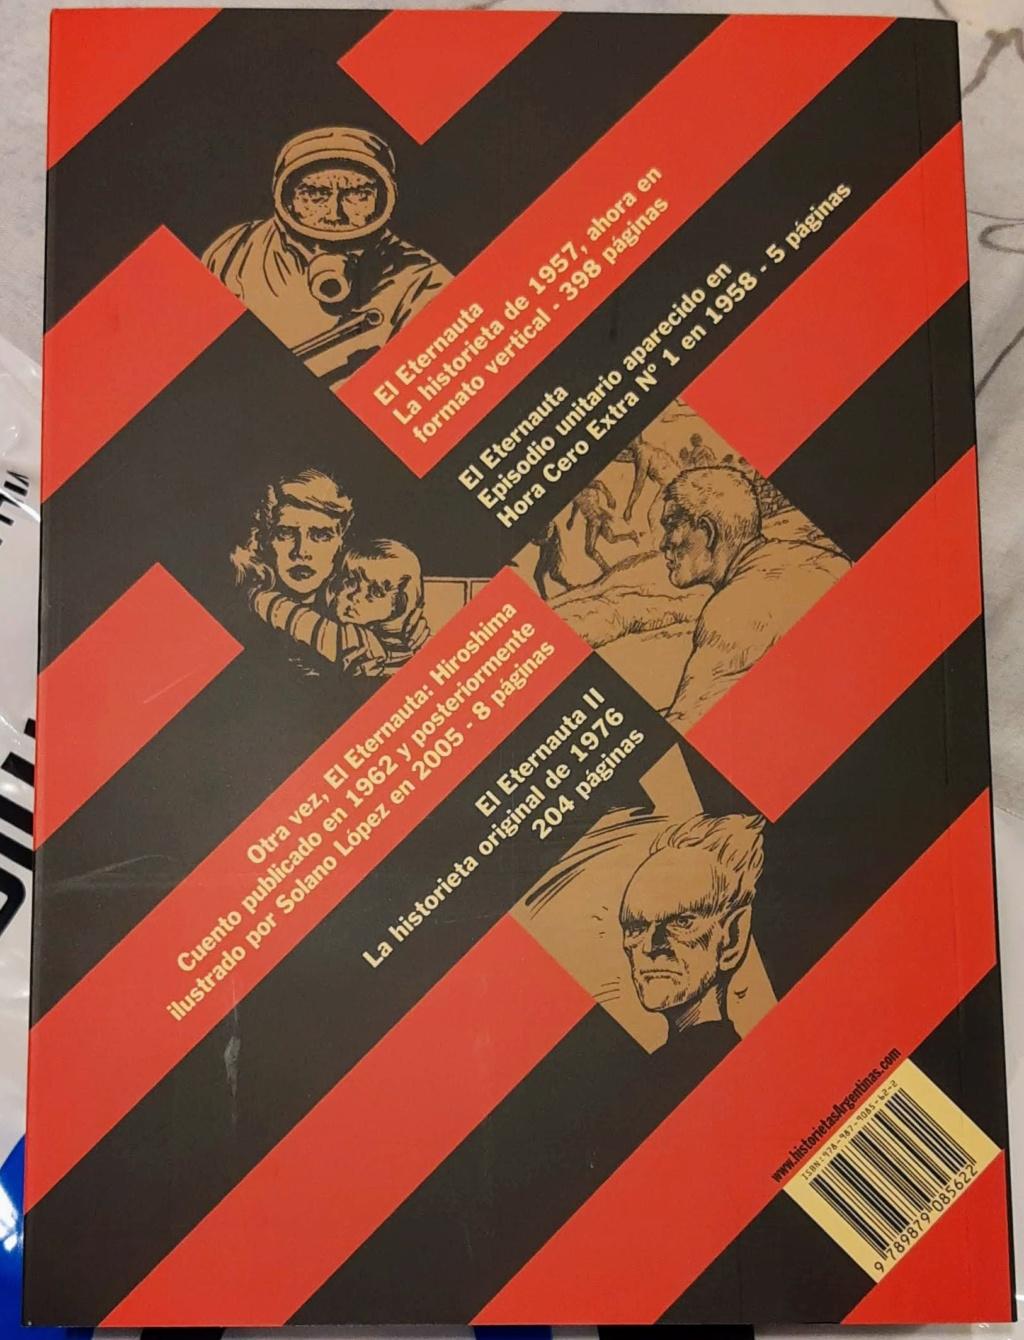 61 - [Comics] Siguen las adquisiciones 2020-2021 - Página 3 Img_2011